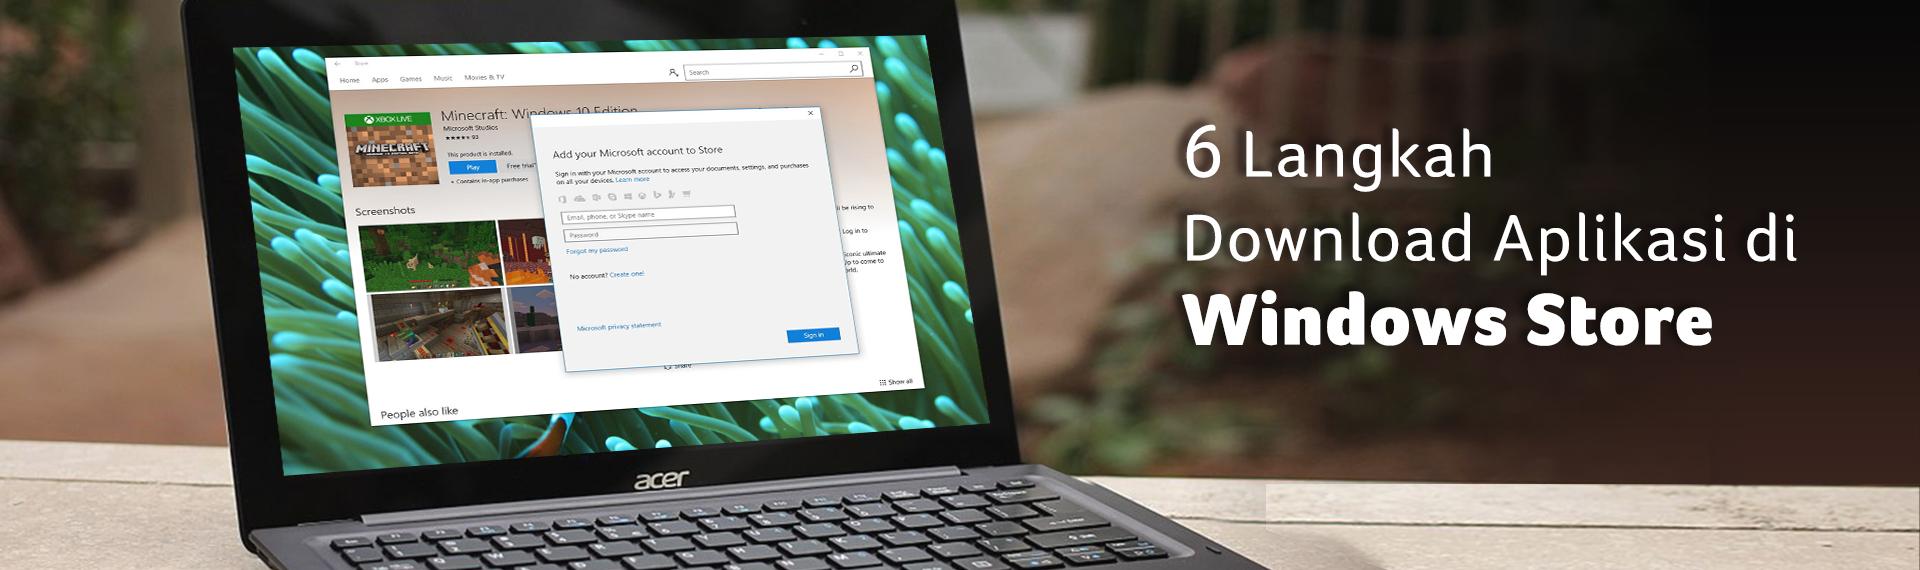 6 Langkah Download Aplikasi di Windows Store